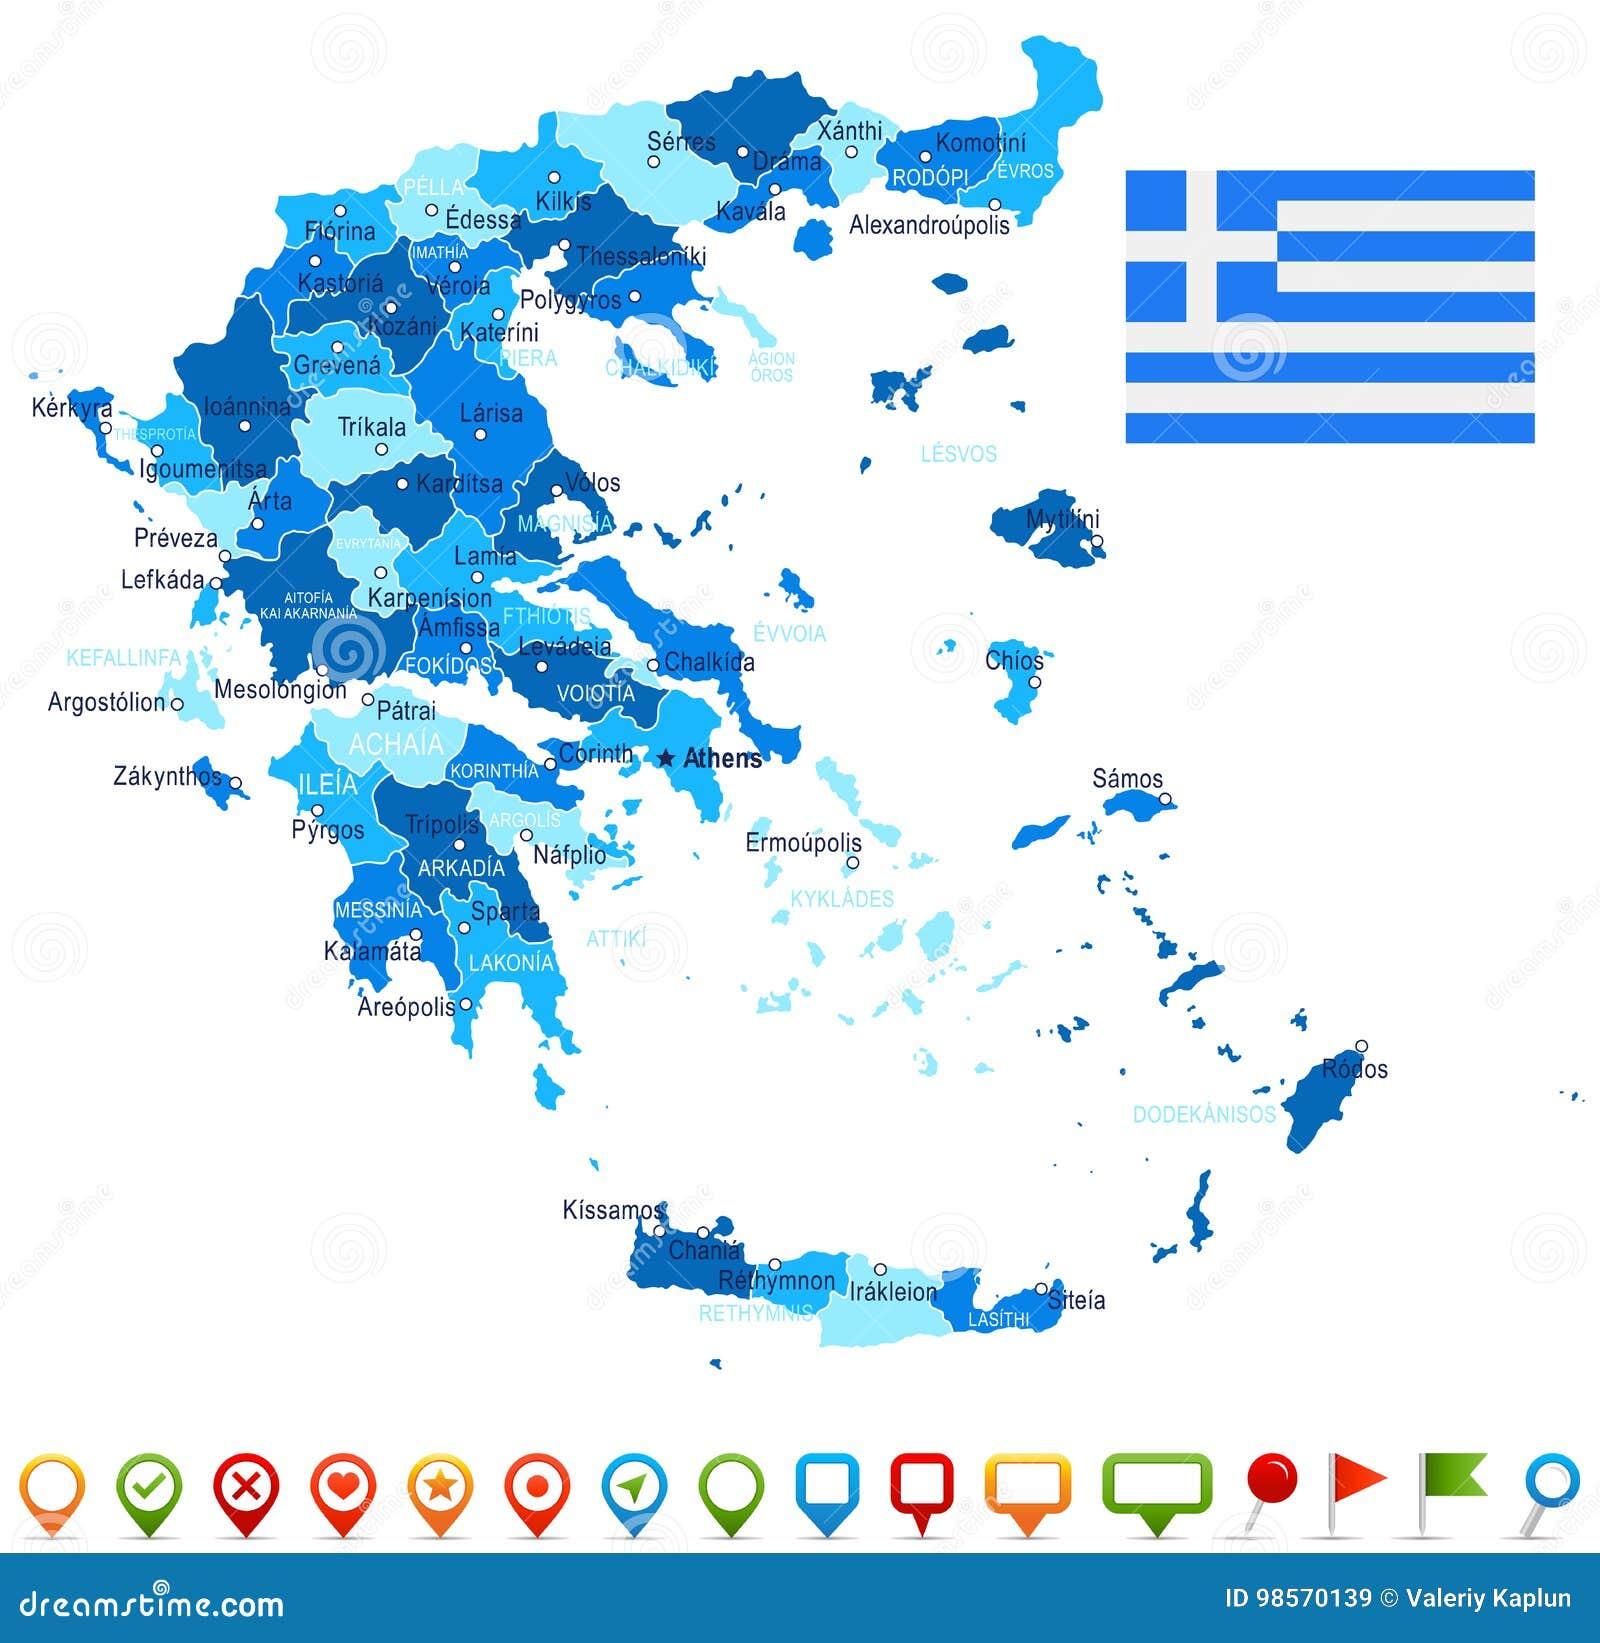 Karte Griechenland.Griechenland Karten Und Flaggenillustration Stock Abbildung